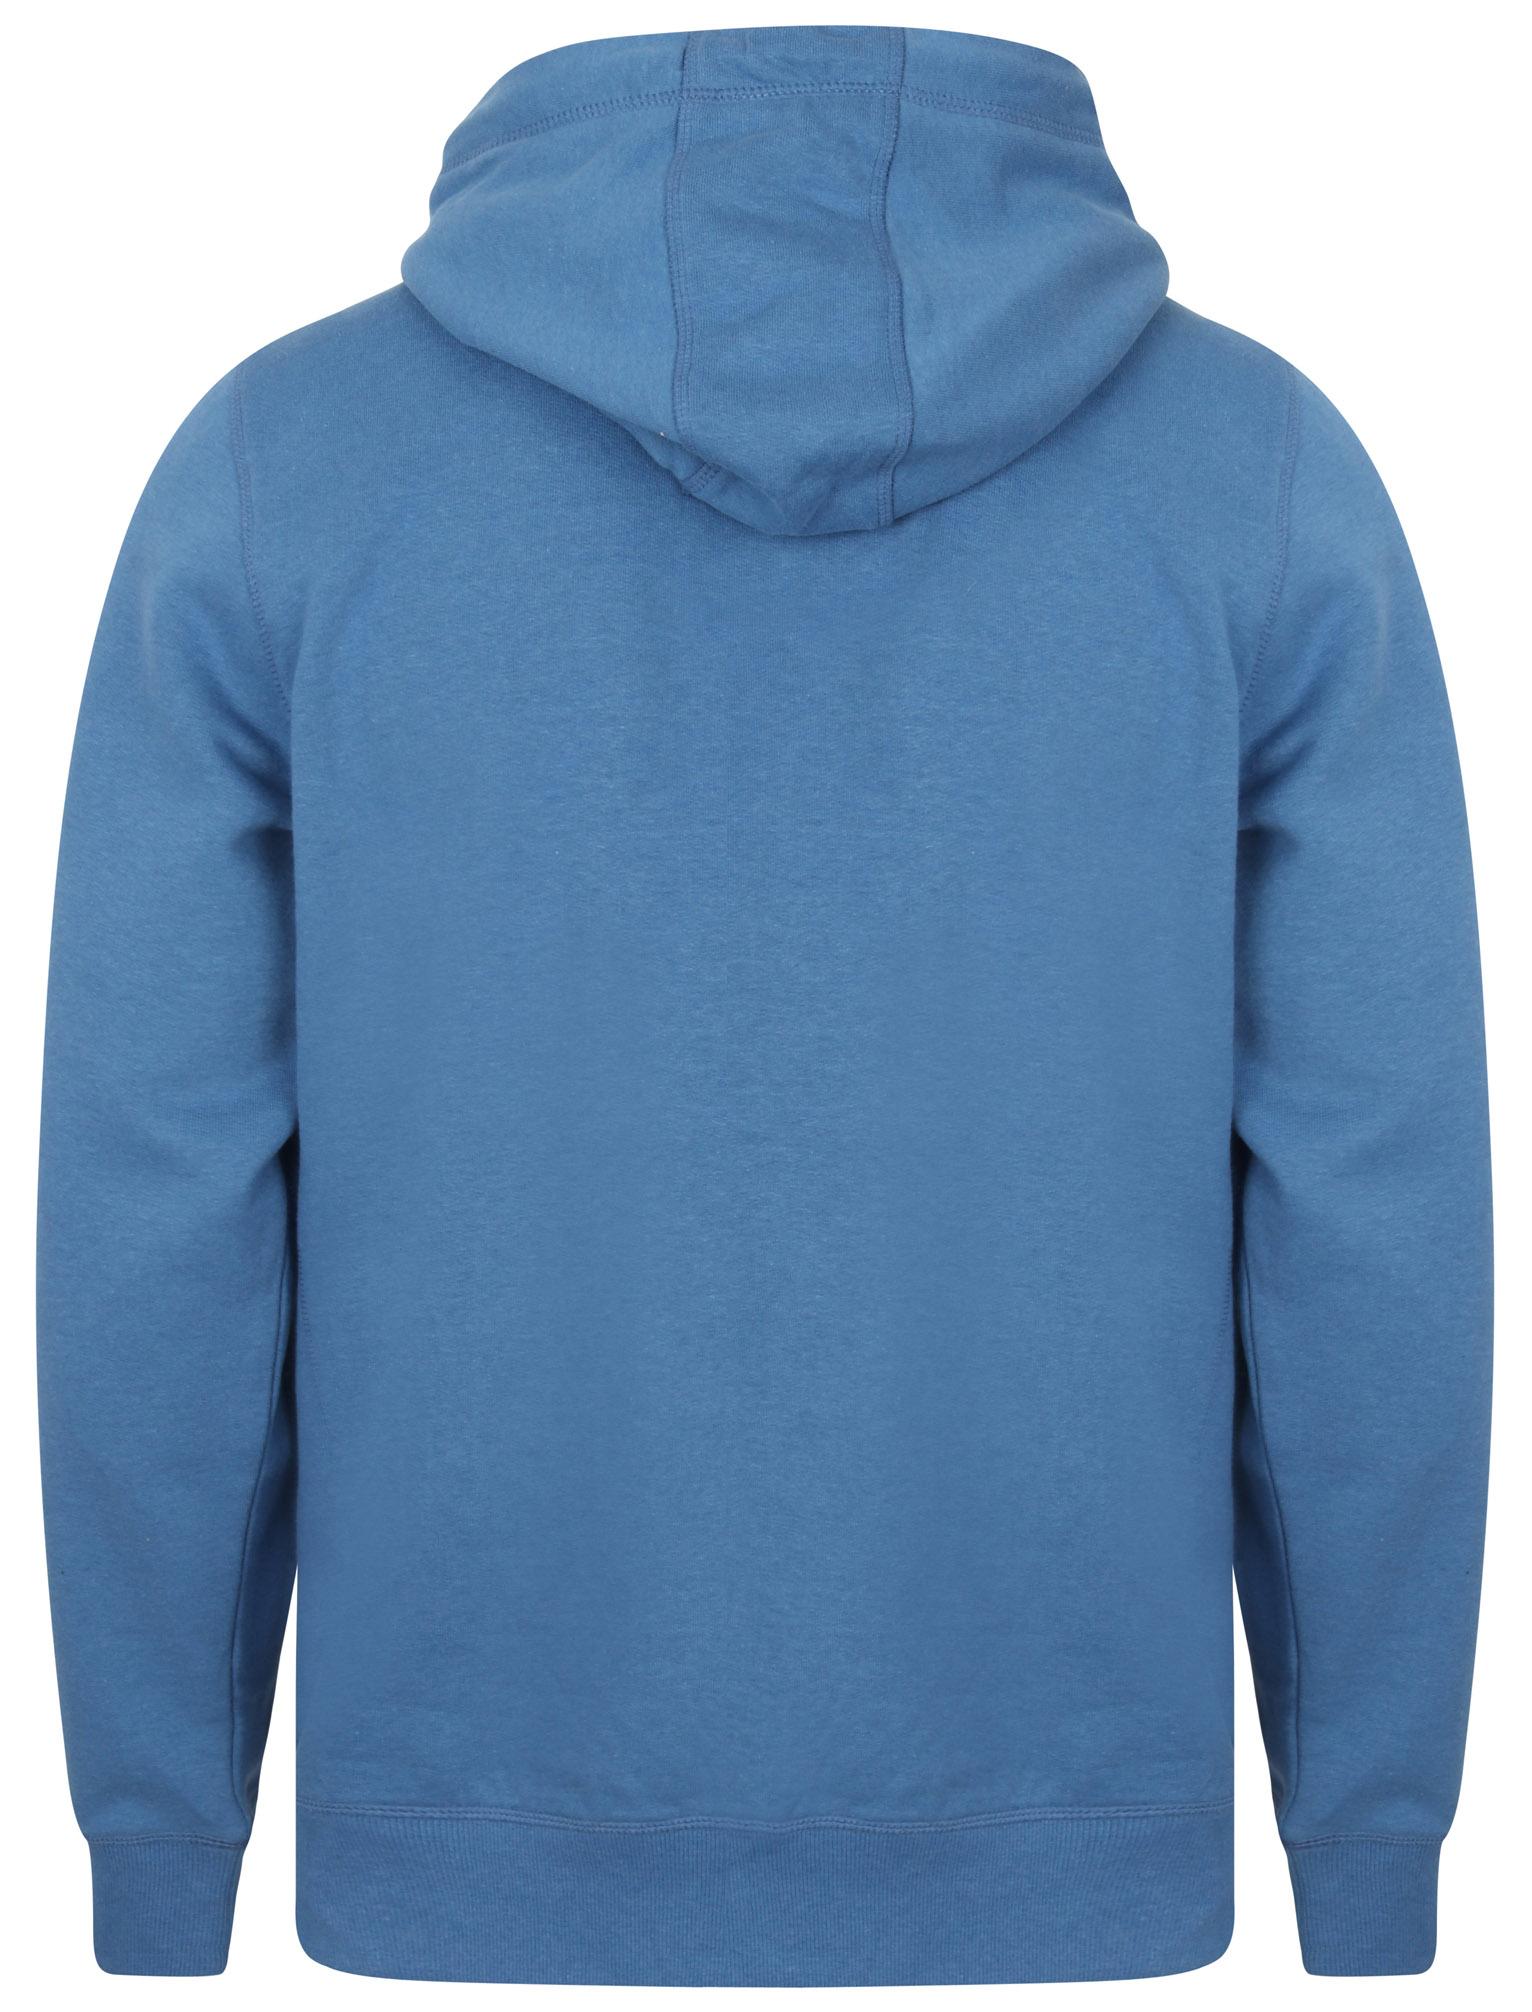 Tokyo-Laundry-Men-039-s-Harper-Zip-Up-Hoodie-Hooded-Top-Sweatshirt-Sweater-Jacket thumbnail 7